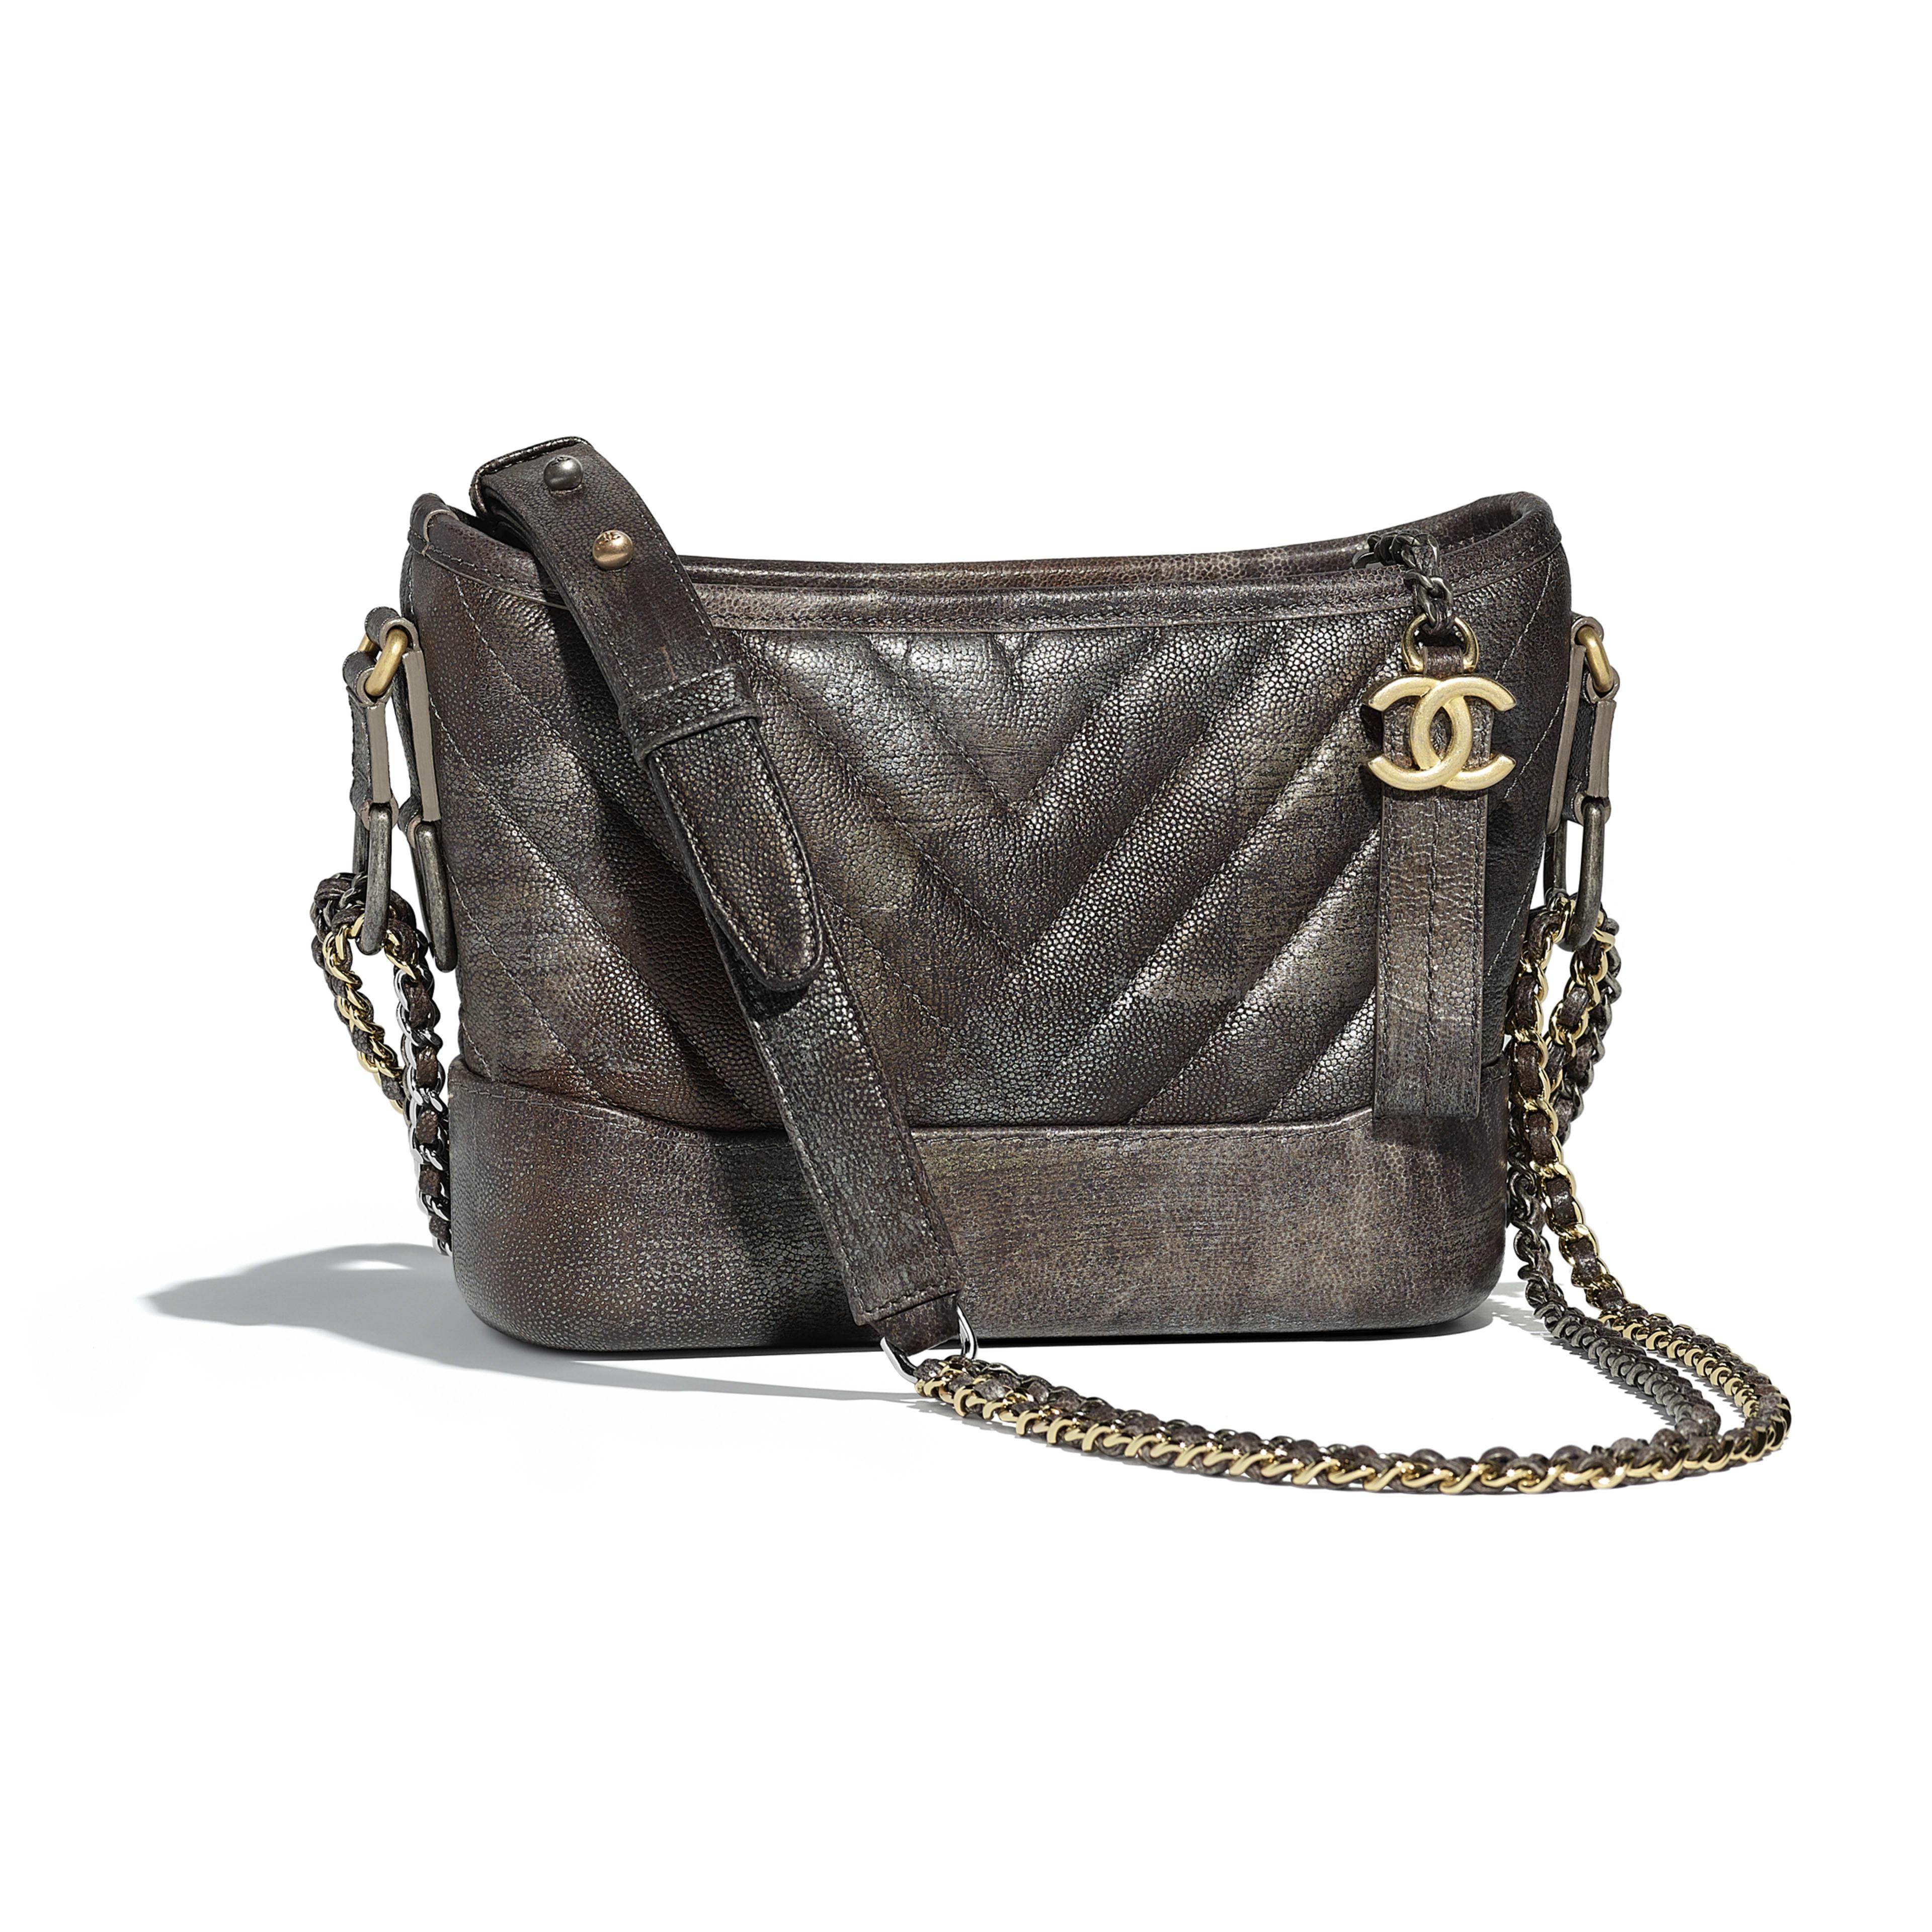 Chanel S Gabrielle Small Hobo Bag Dark Silver Gold Metallic Grained Goatskin